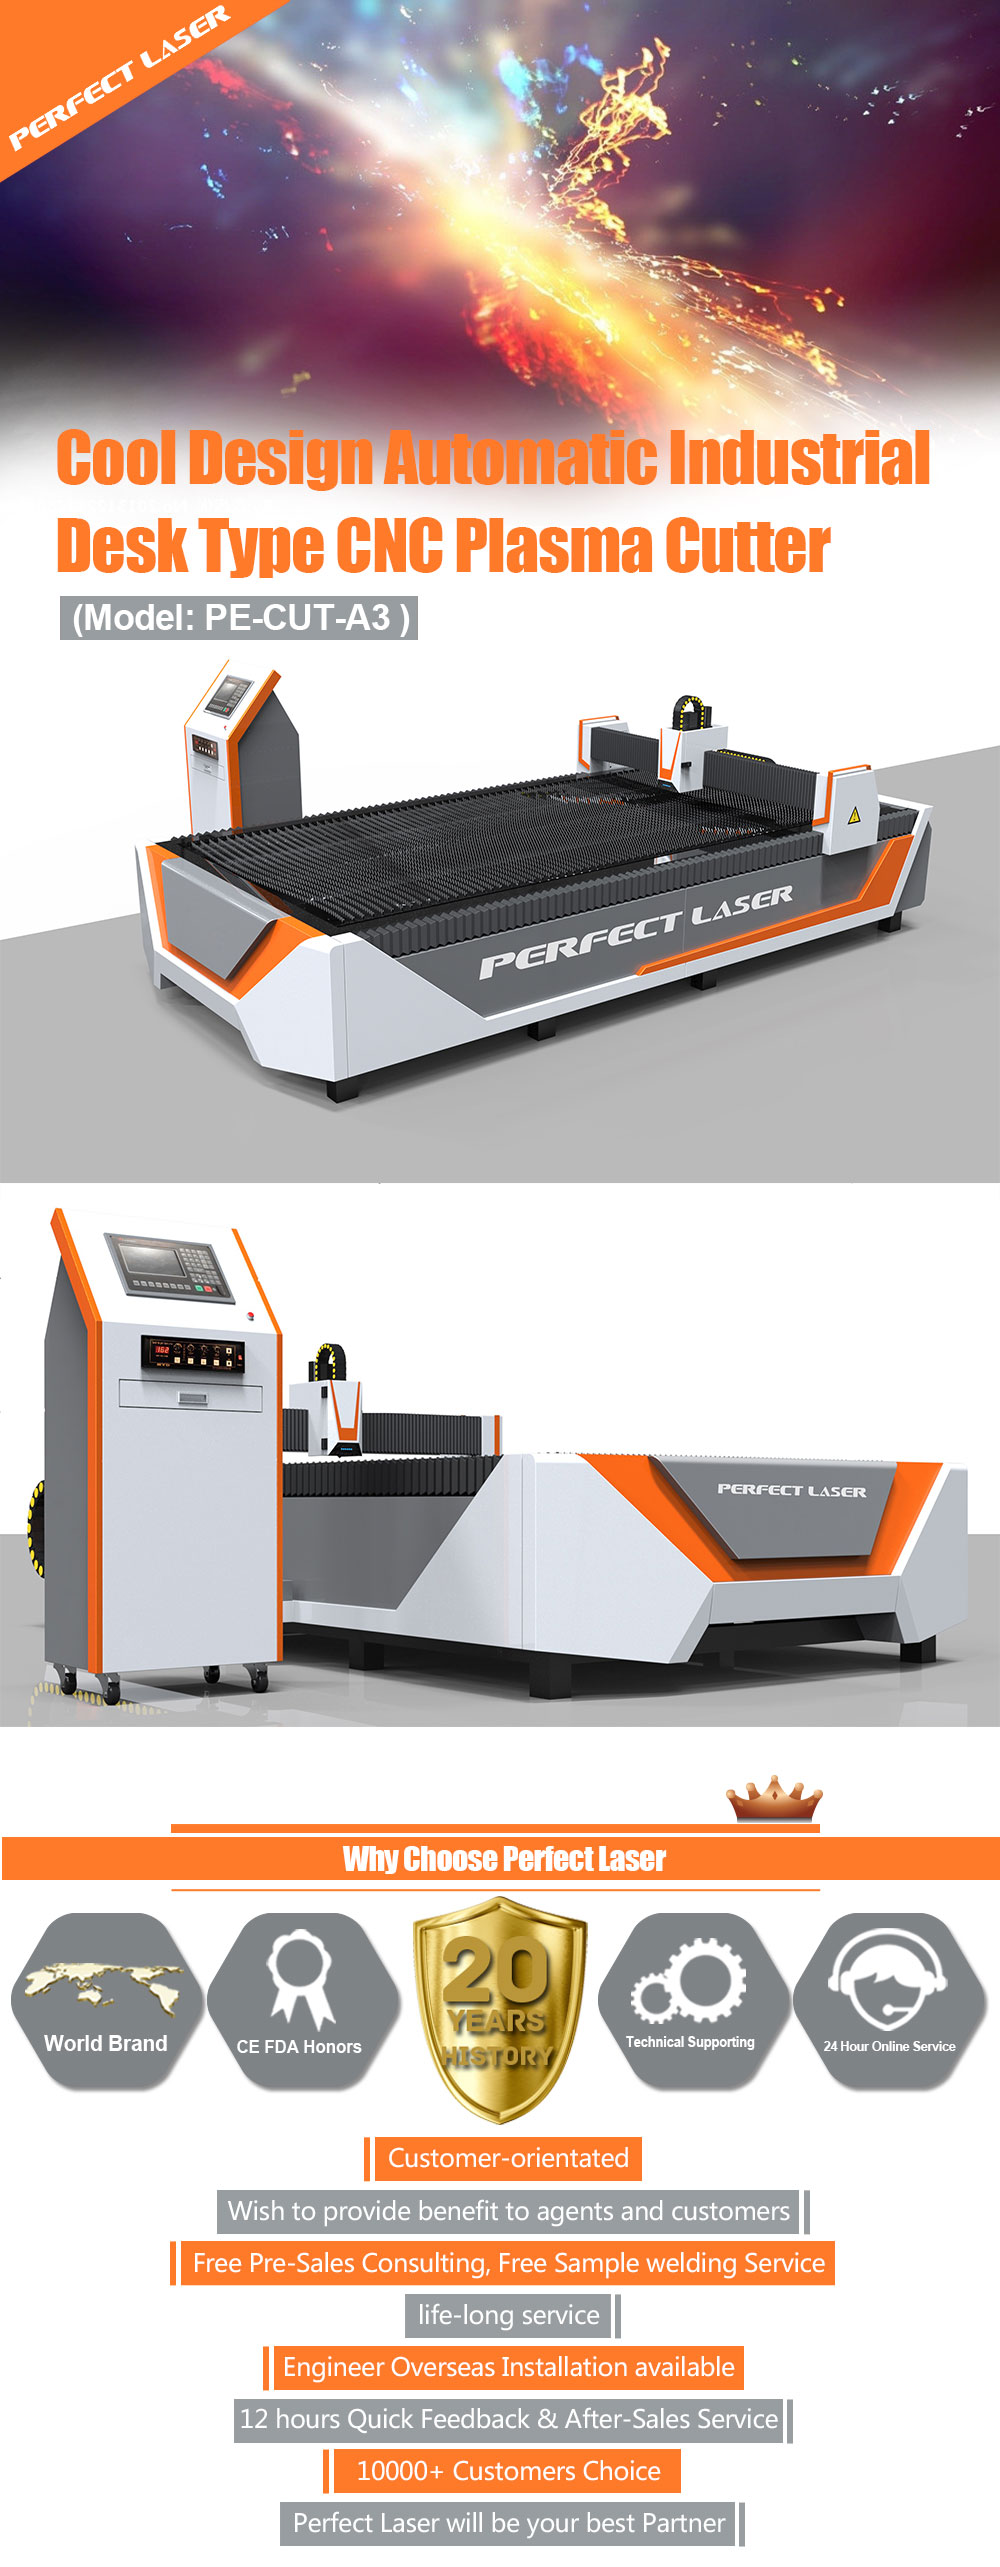 Us Power Supply Technology Stainless Steel Cnc Plasma Metal Cutting Laser Cutter Wiring Diagram Machine Price